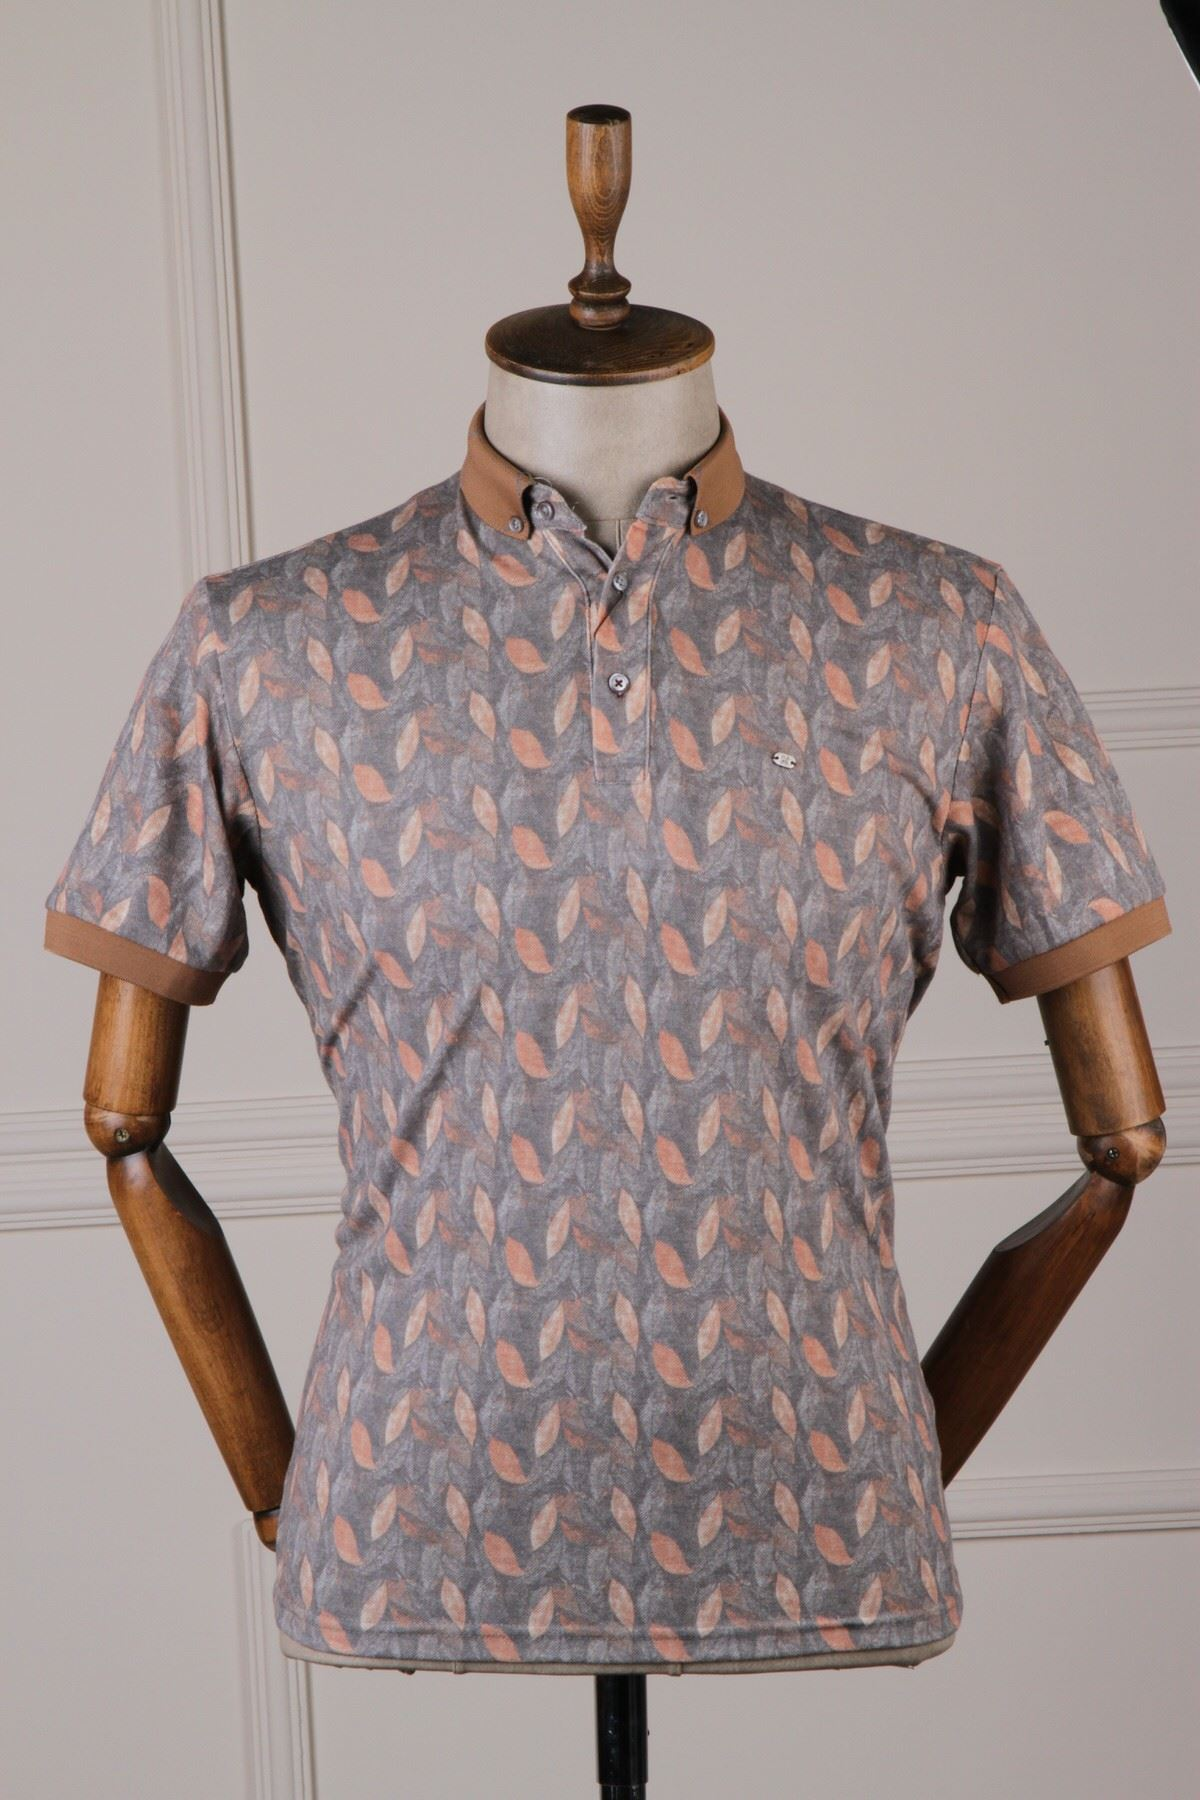 Erkek Yaprak Desenli T-shirt - Camel